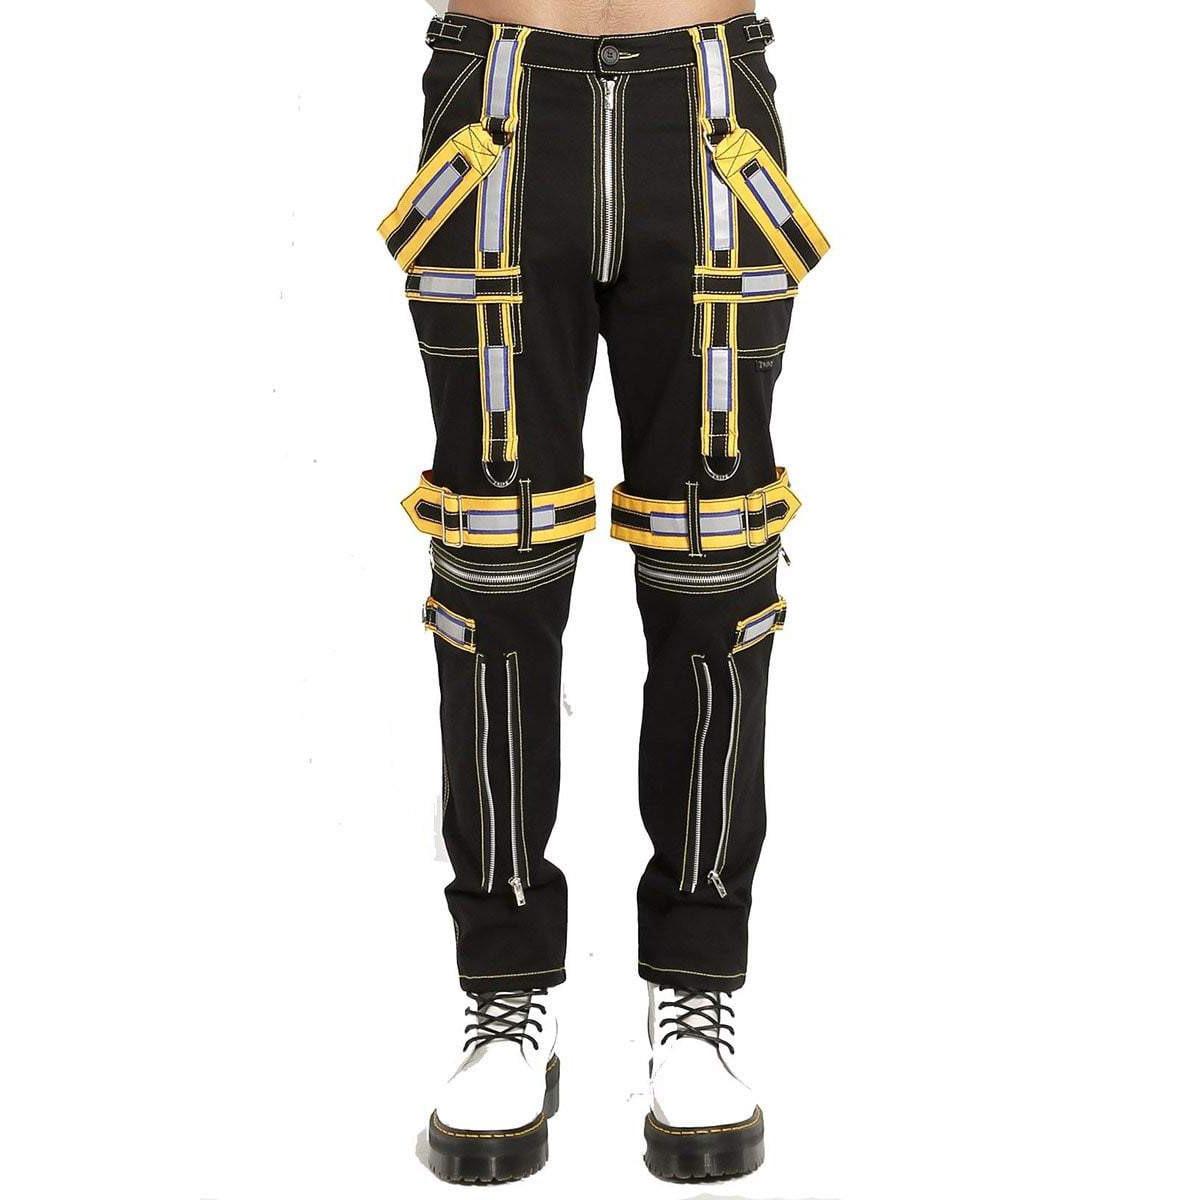 Men's Handmade Electro Bondage Rave Gothic Cyber Chain Gothic Jeans Punk Rock Tripp Black/Yellow Pant's